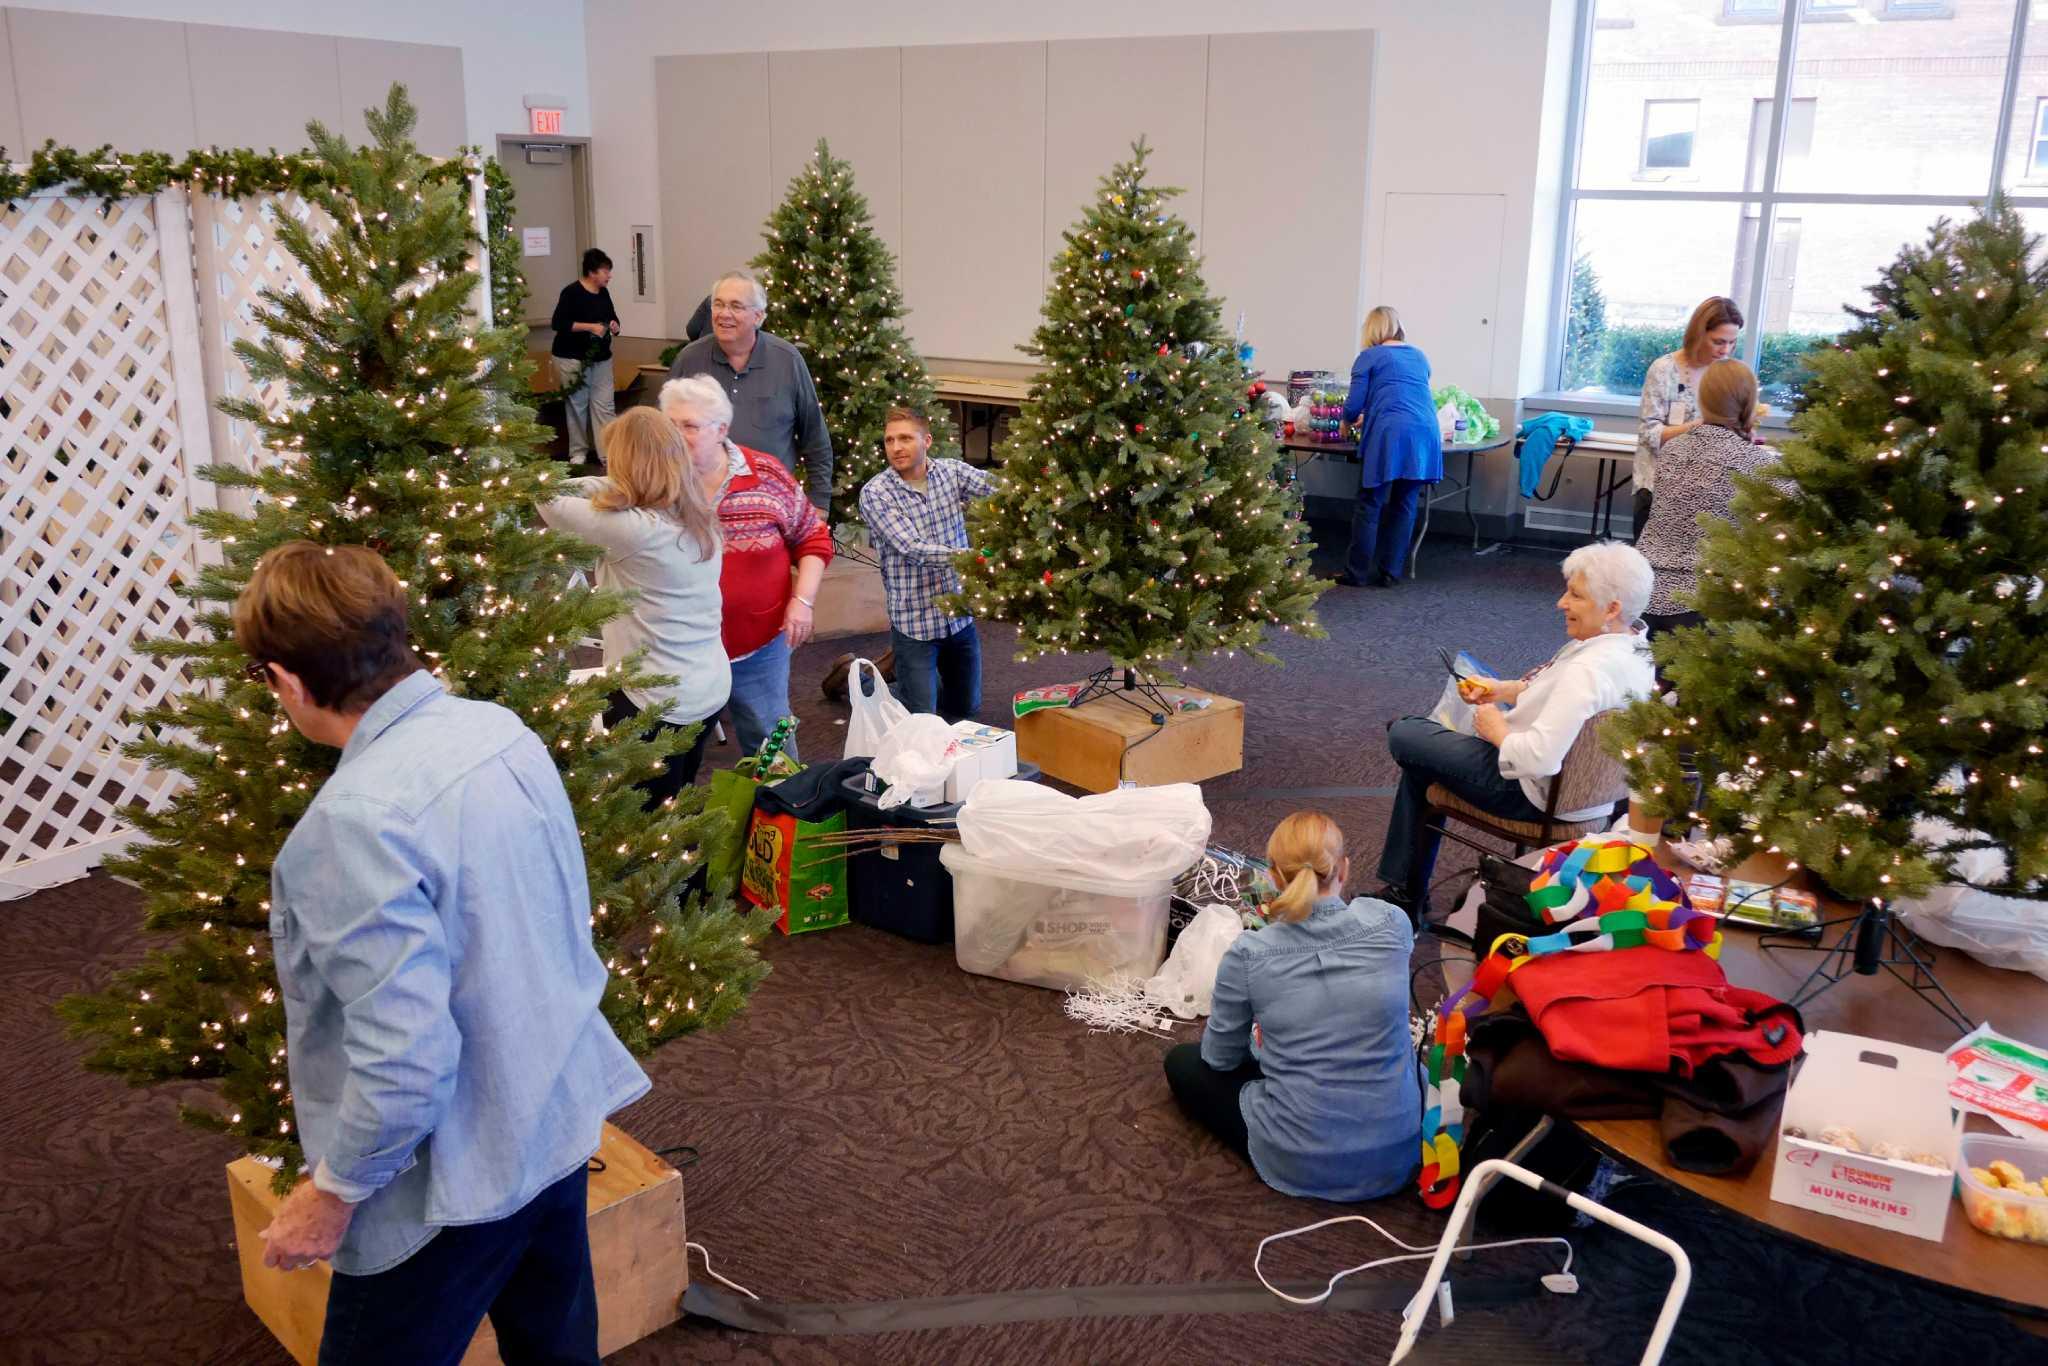 Photos: Christmas trees ready for Saratoga festival - Times Union